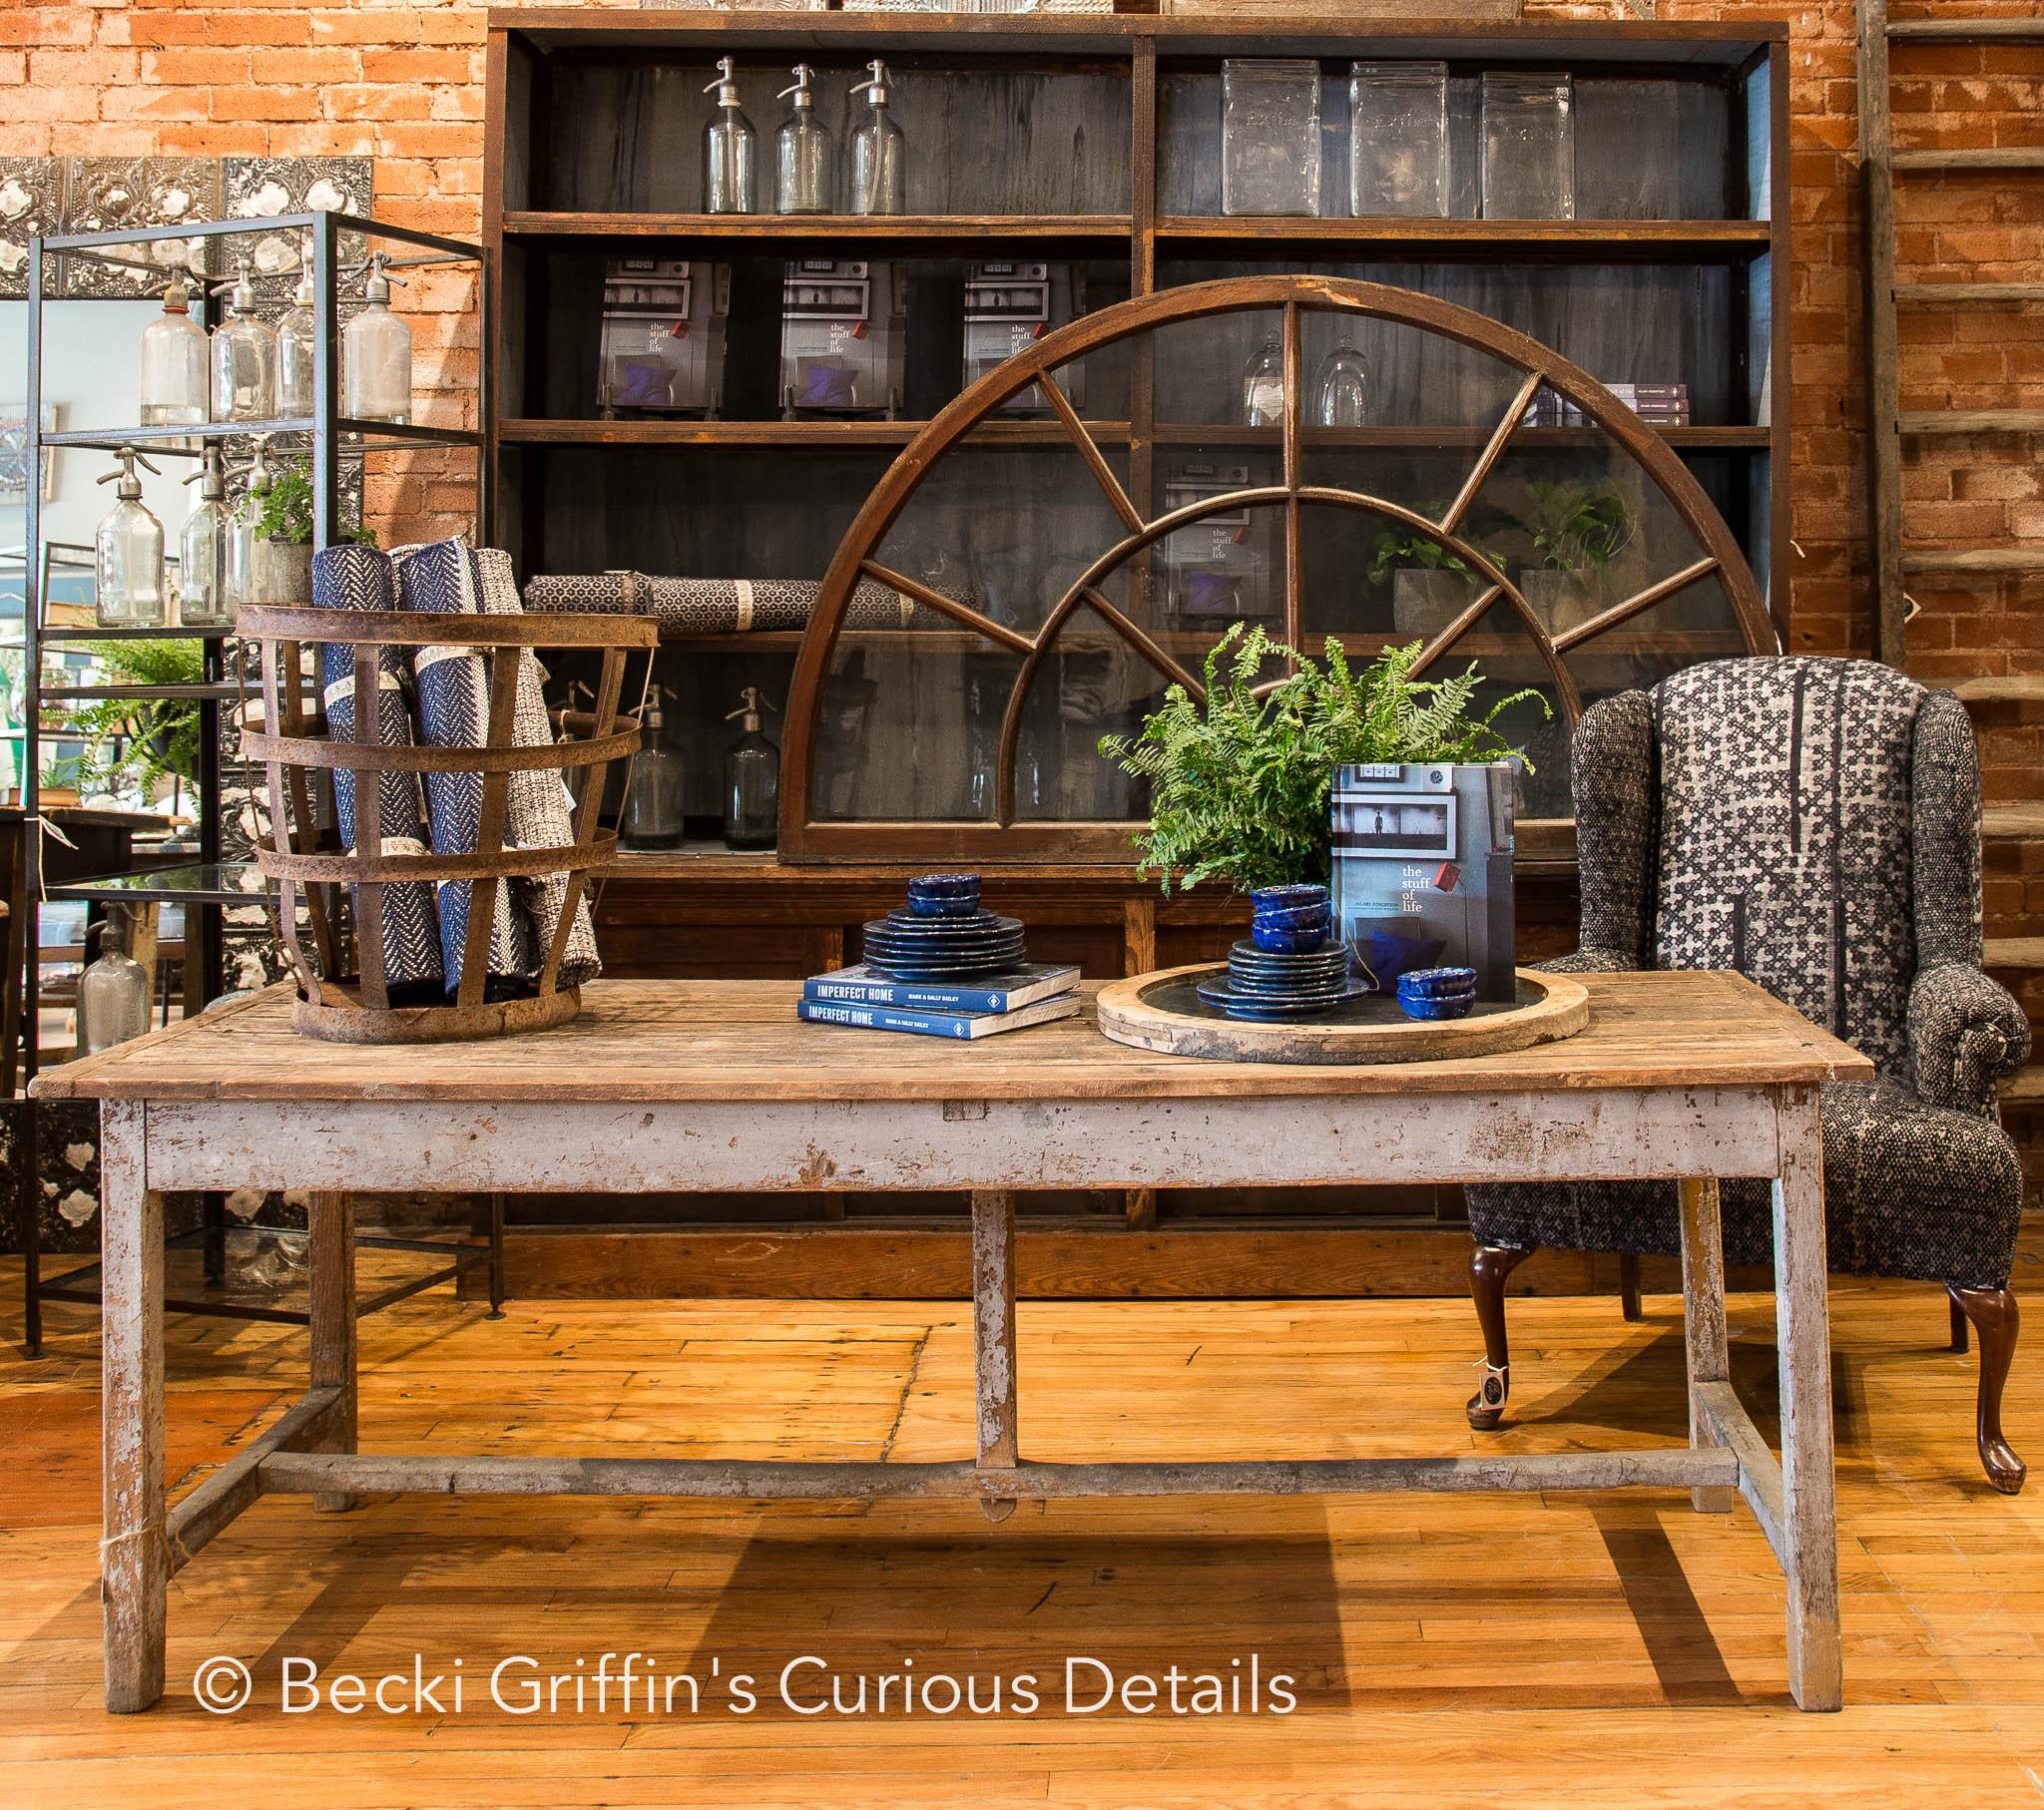 Becki Griffin's Curious Details   Old Glory Antiques Denver